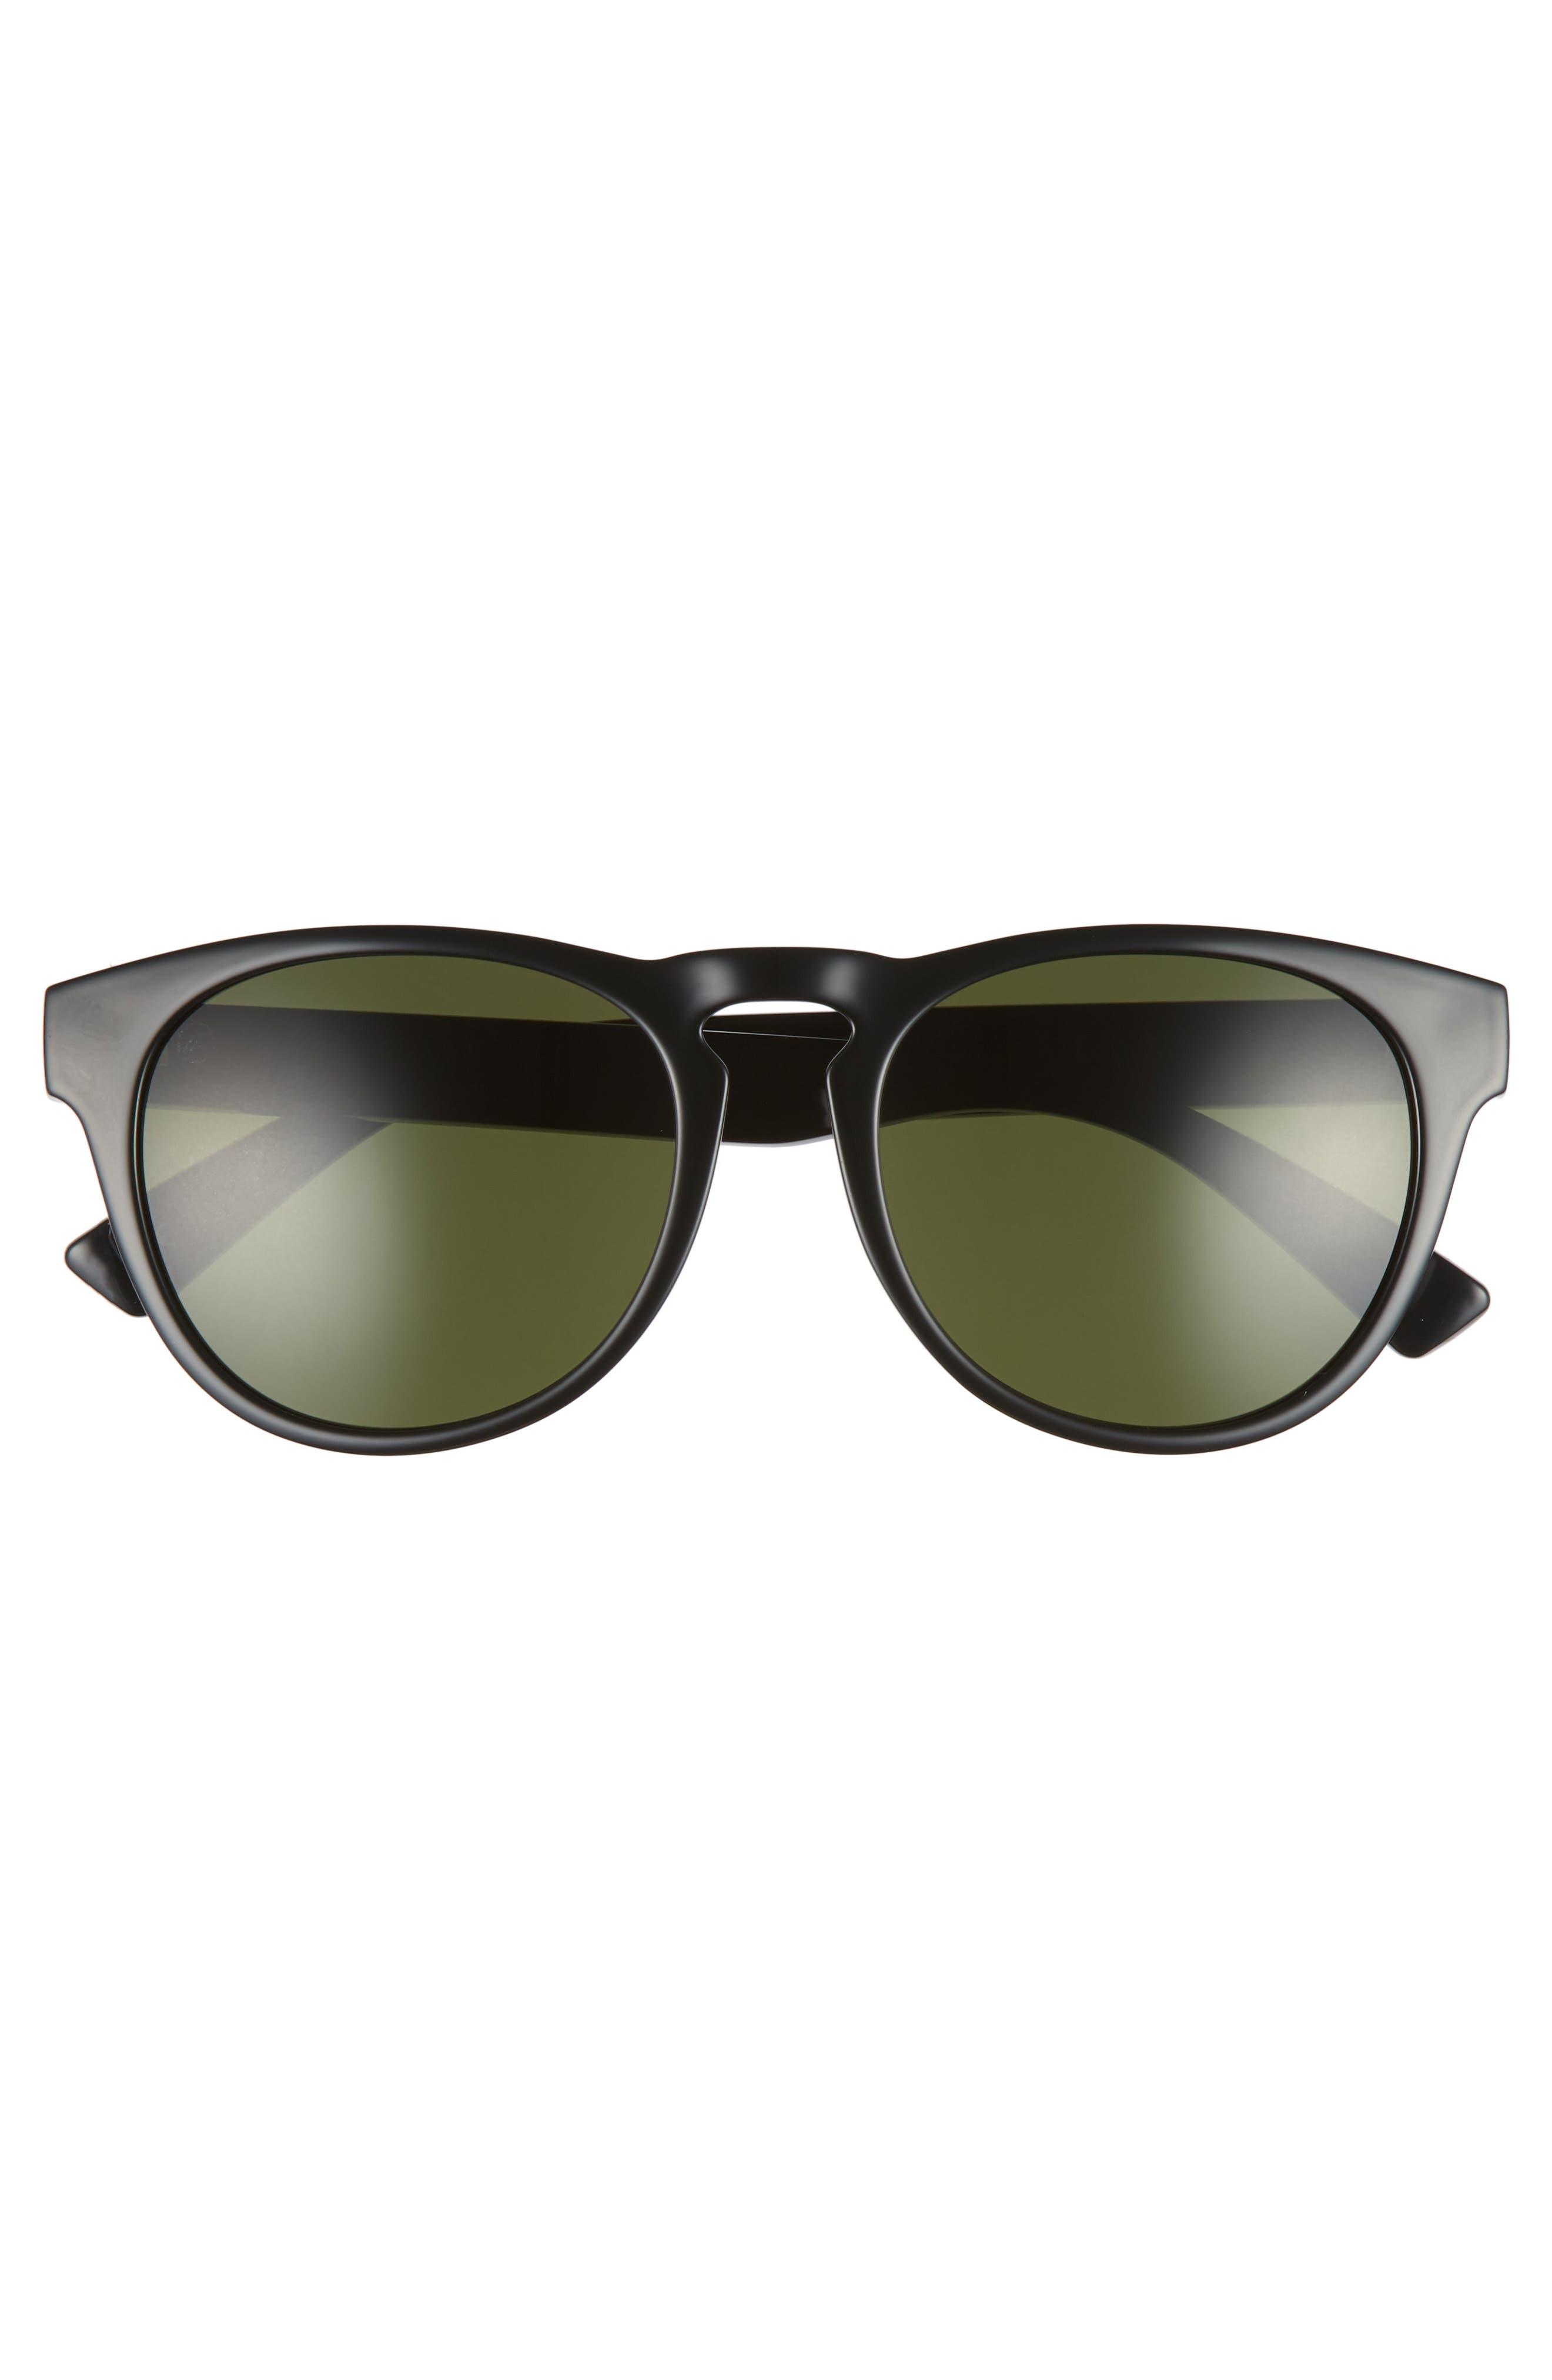 Nashville XL 52mm Melanin Infused Sunglasses,                             Alternate thumbnail 3, color,                             GLOSS BLACK/ GREY